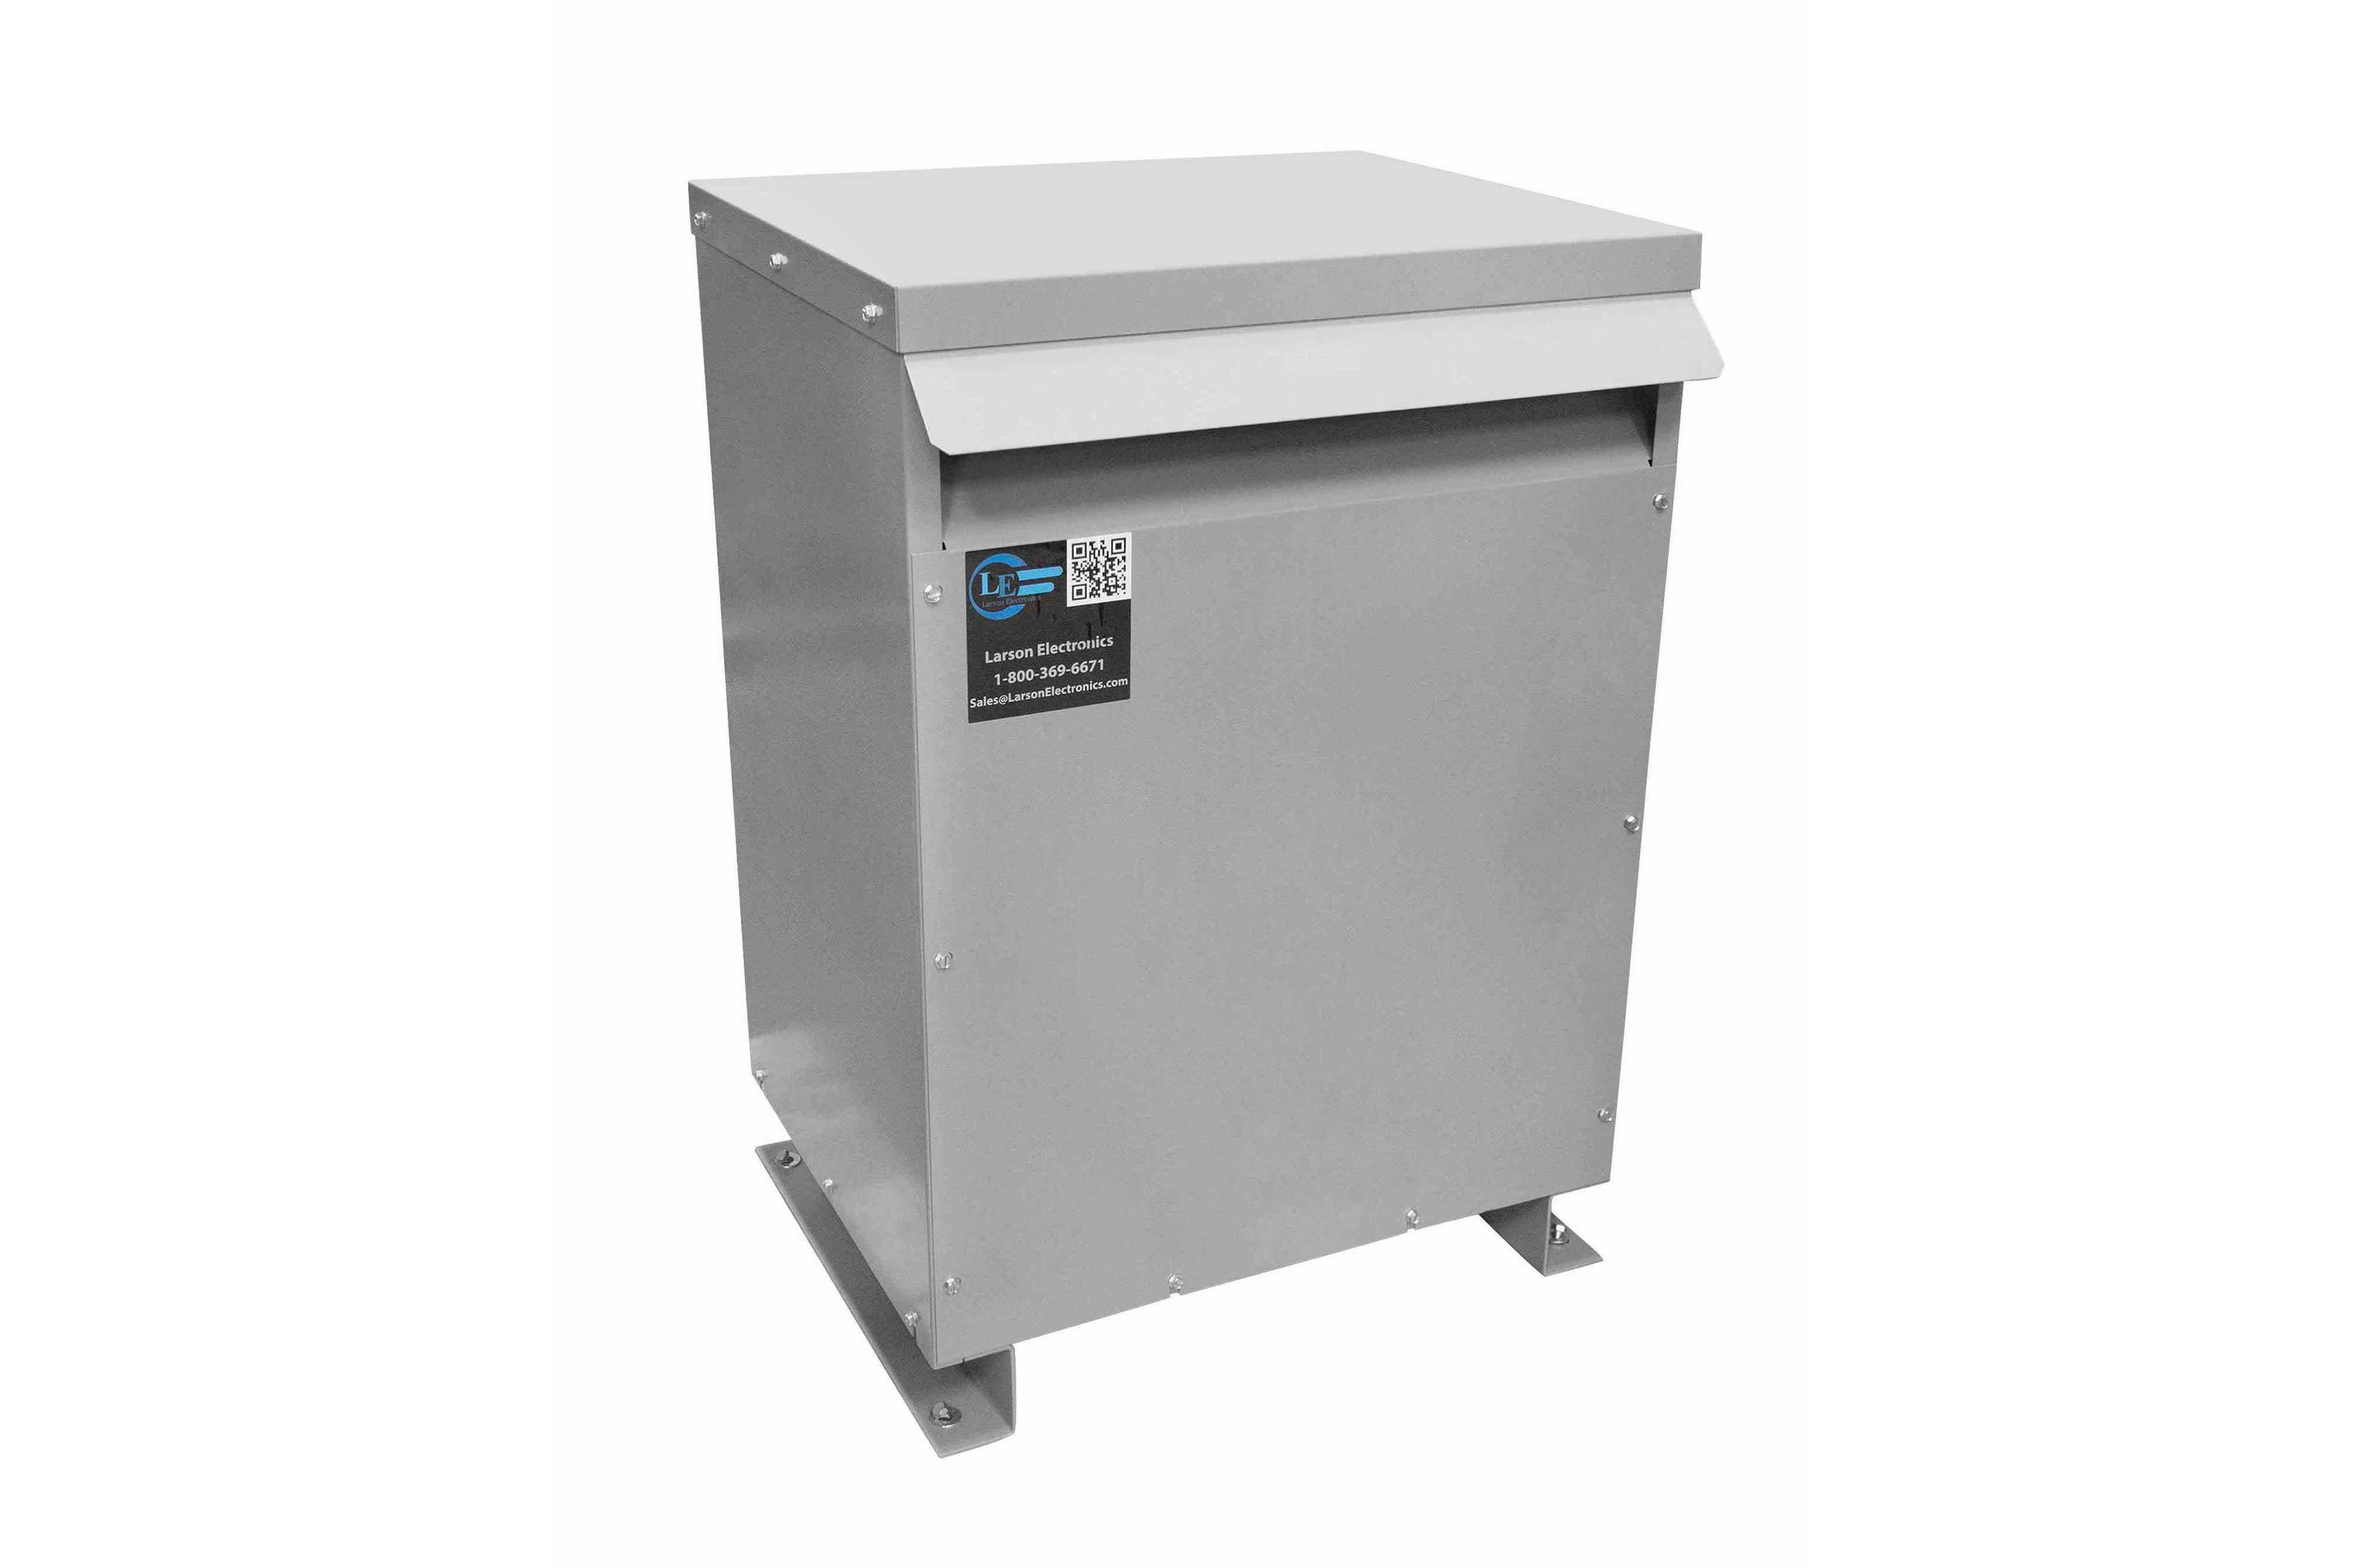 70 kVA 3PH Isolation Transformer, 240V Wye Primary, 400Y/231 Wye-N Secondary, N3R, Ventilated, 60 Hz